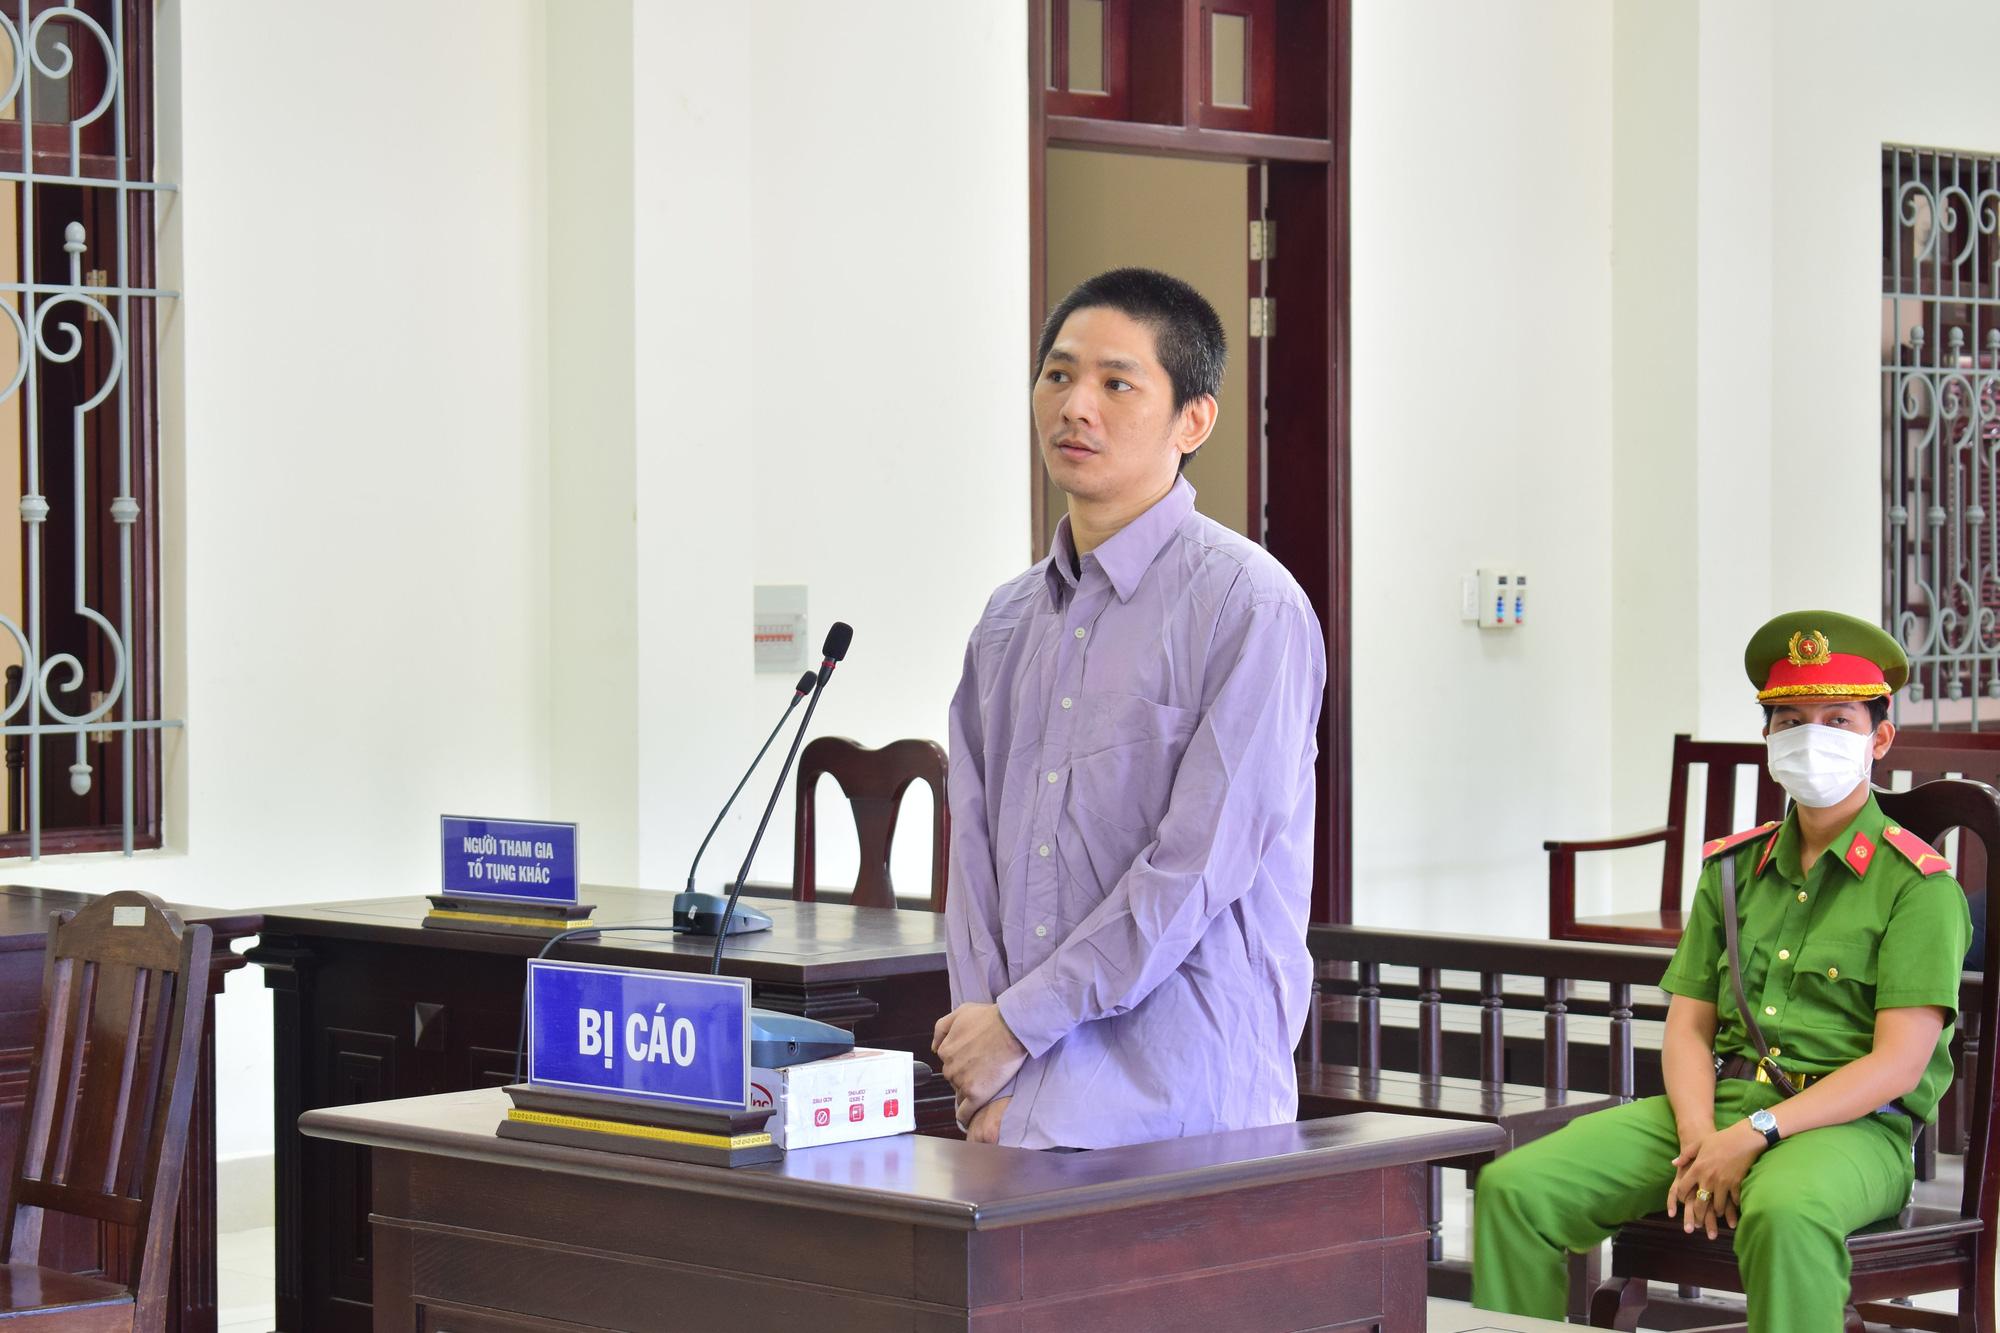 Singaporean man sentenced to death for drug trafficking in Vietnam